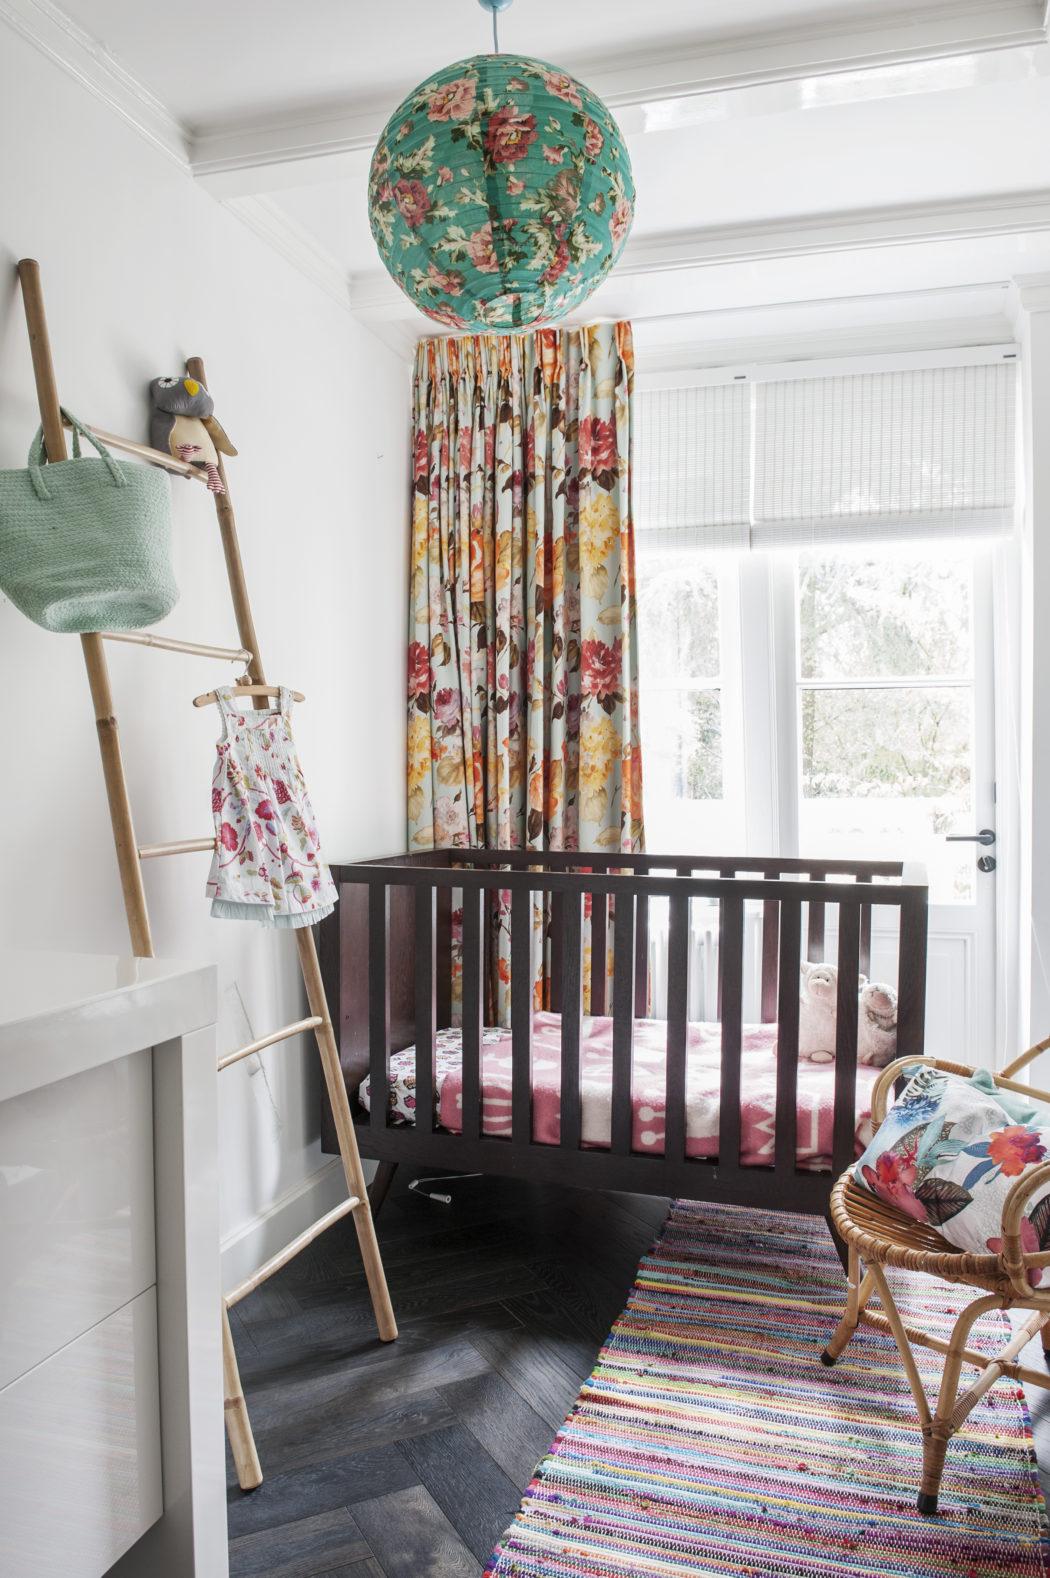 Emejing Cocoon Home Designs Pictures - Interior Design Ideas ...